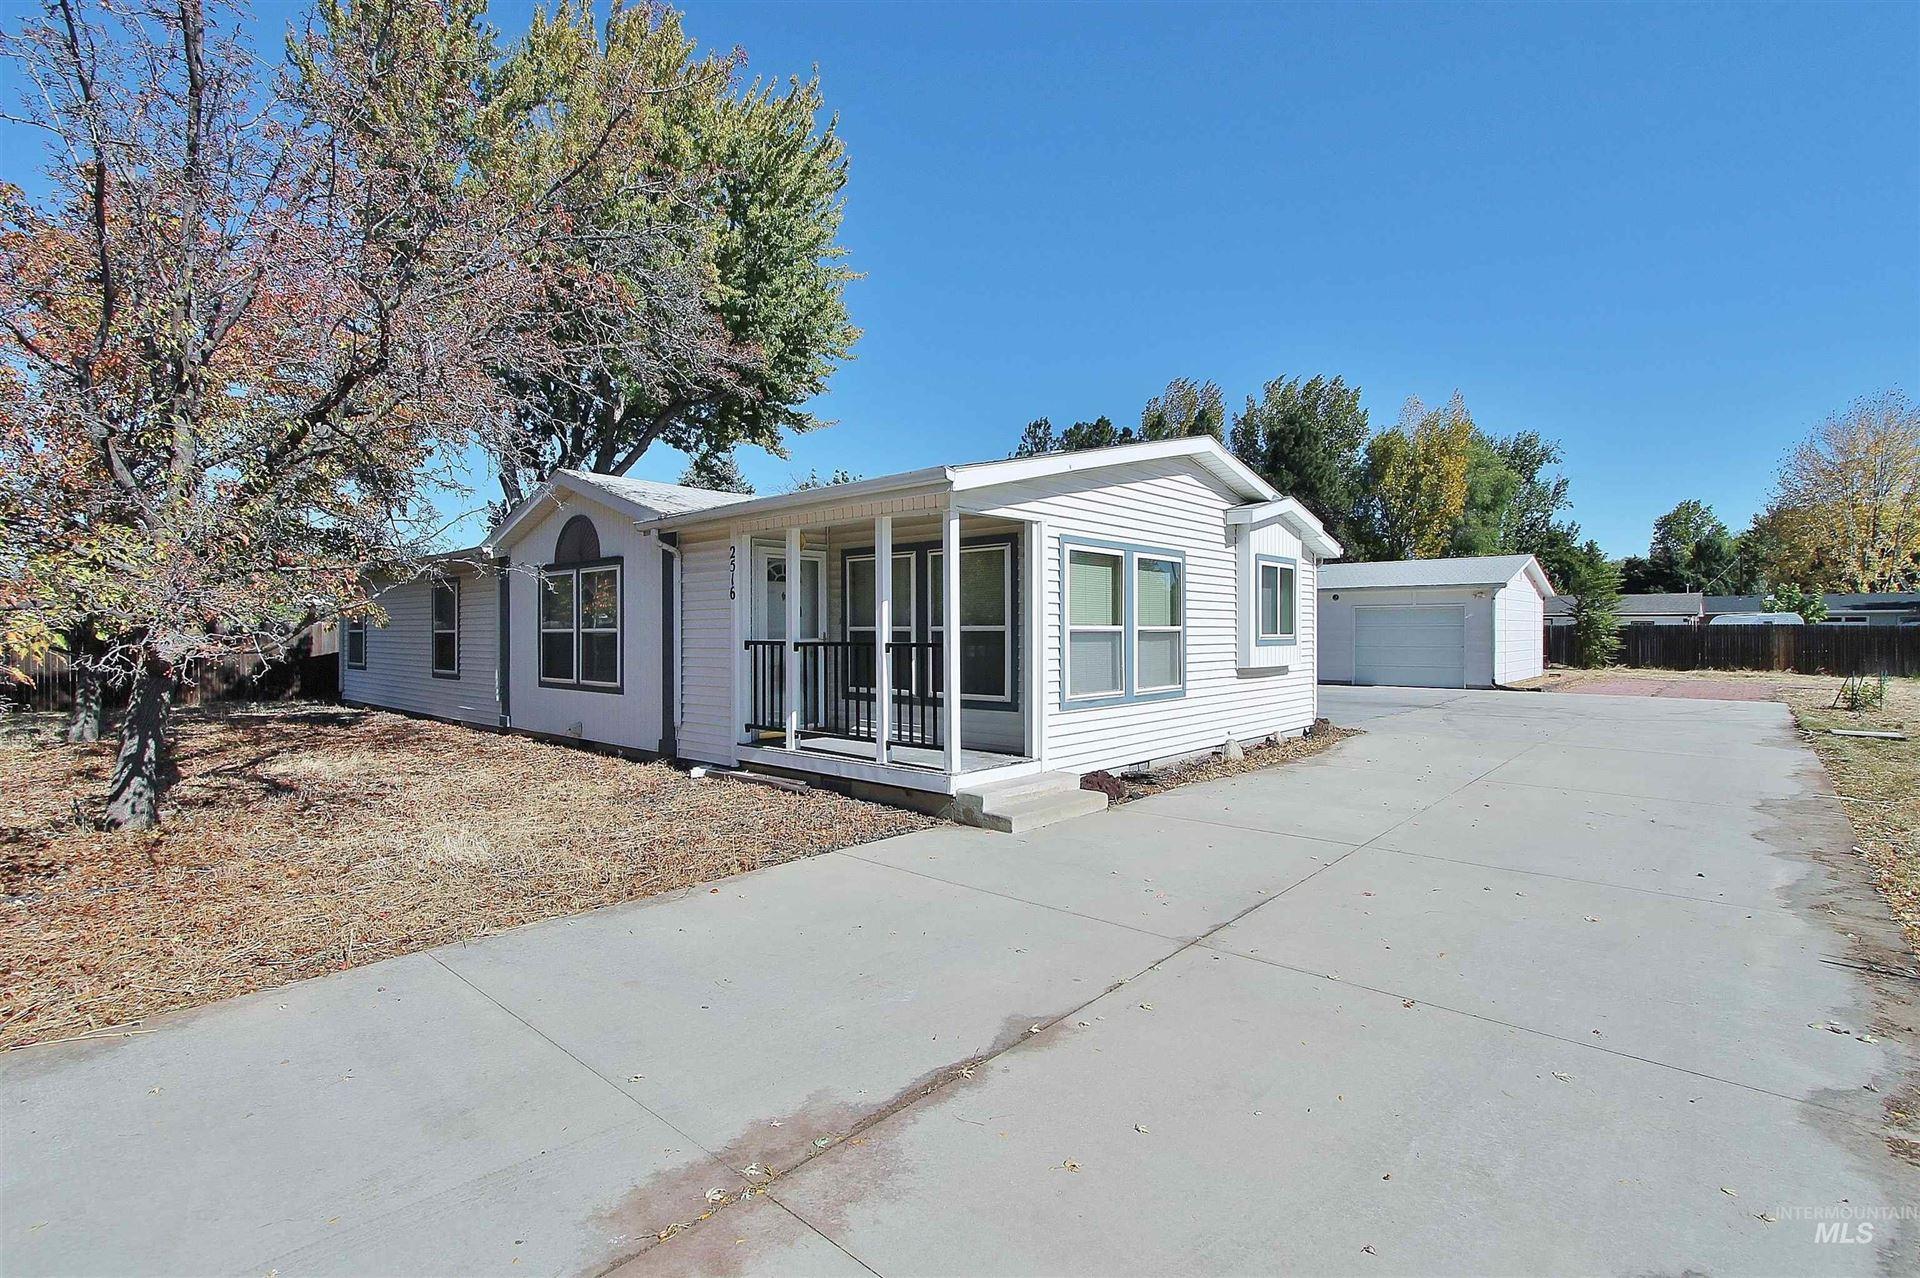 2516 S Pond St, Boise, ID 83705 - MLS#: 98822482